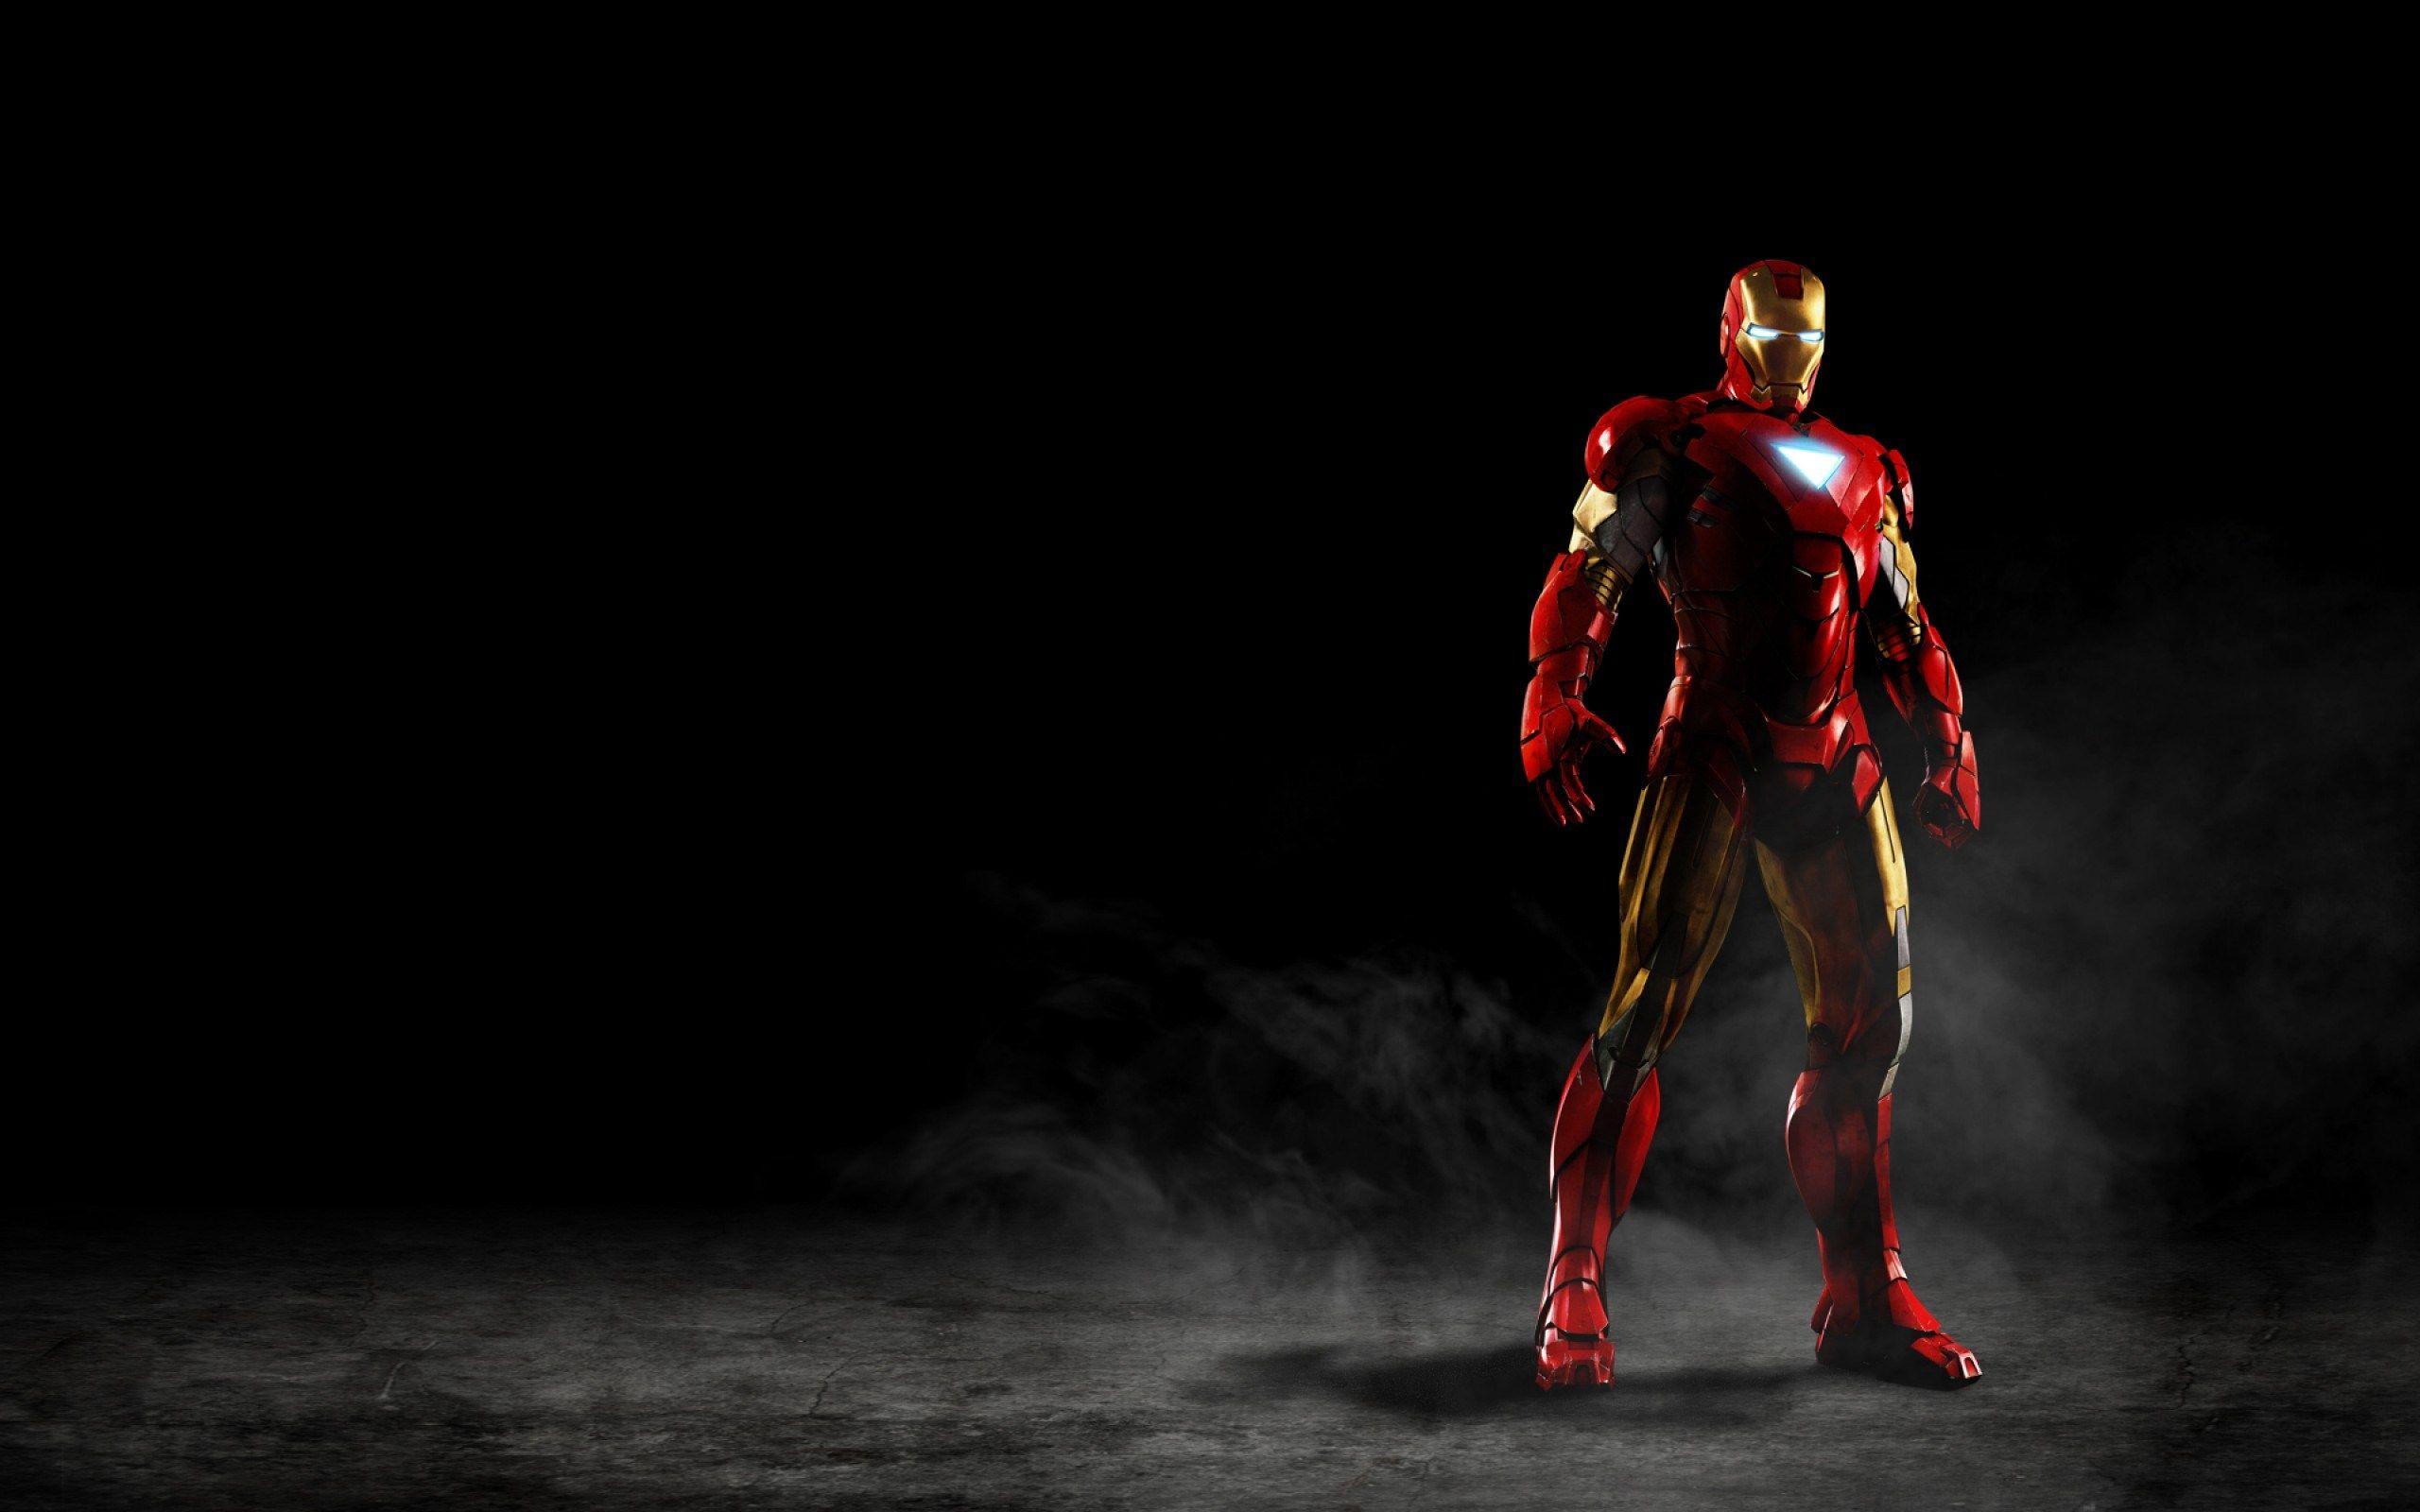 Iron Man Wallpaper (1)